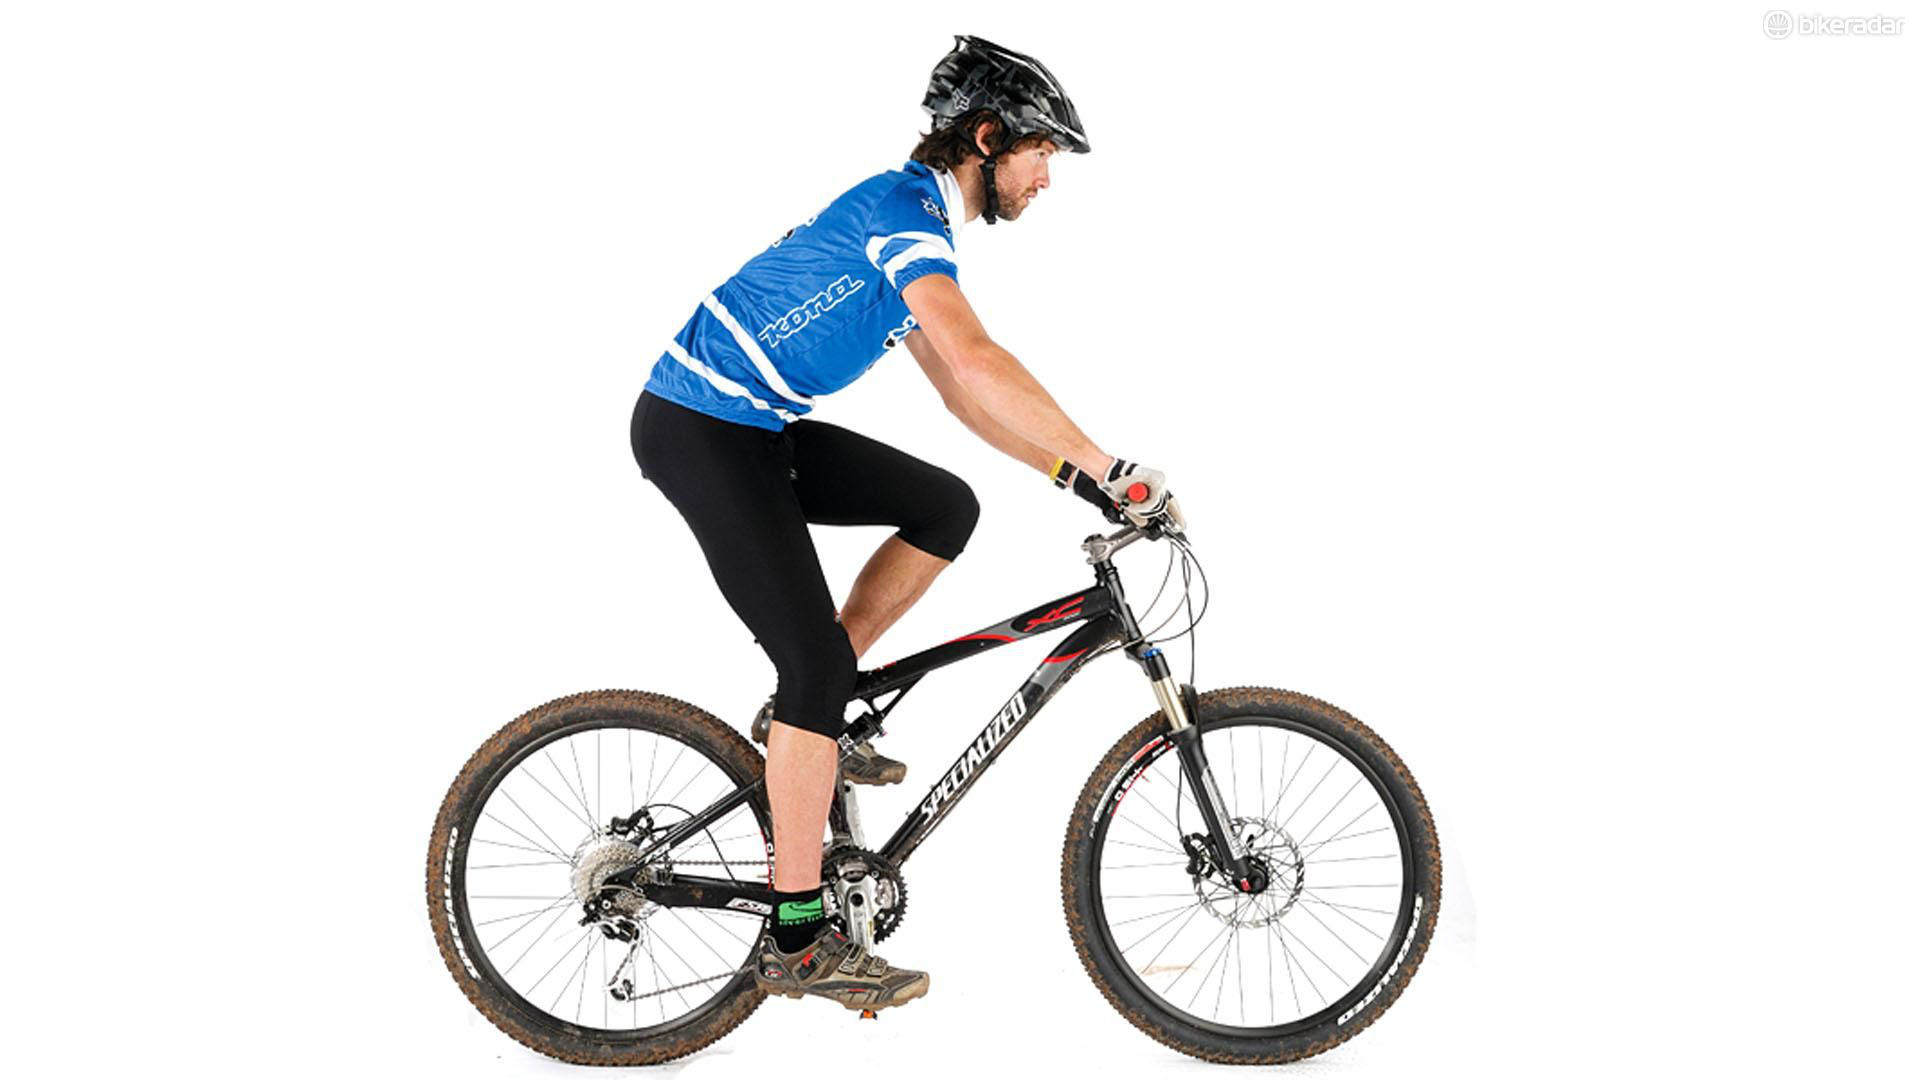 asiento de tu bicicleta a la altura correcta